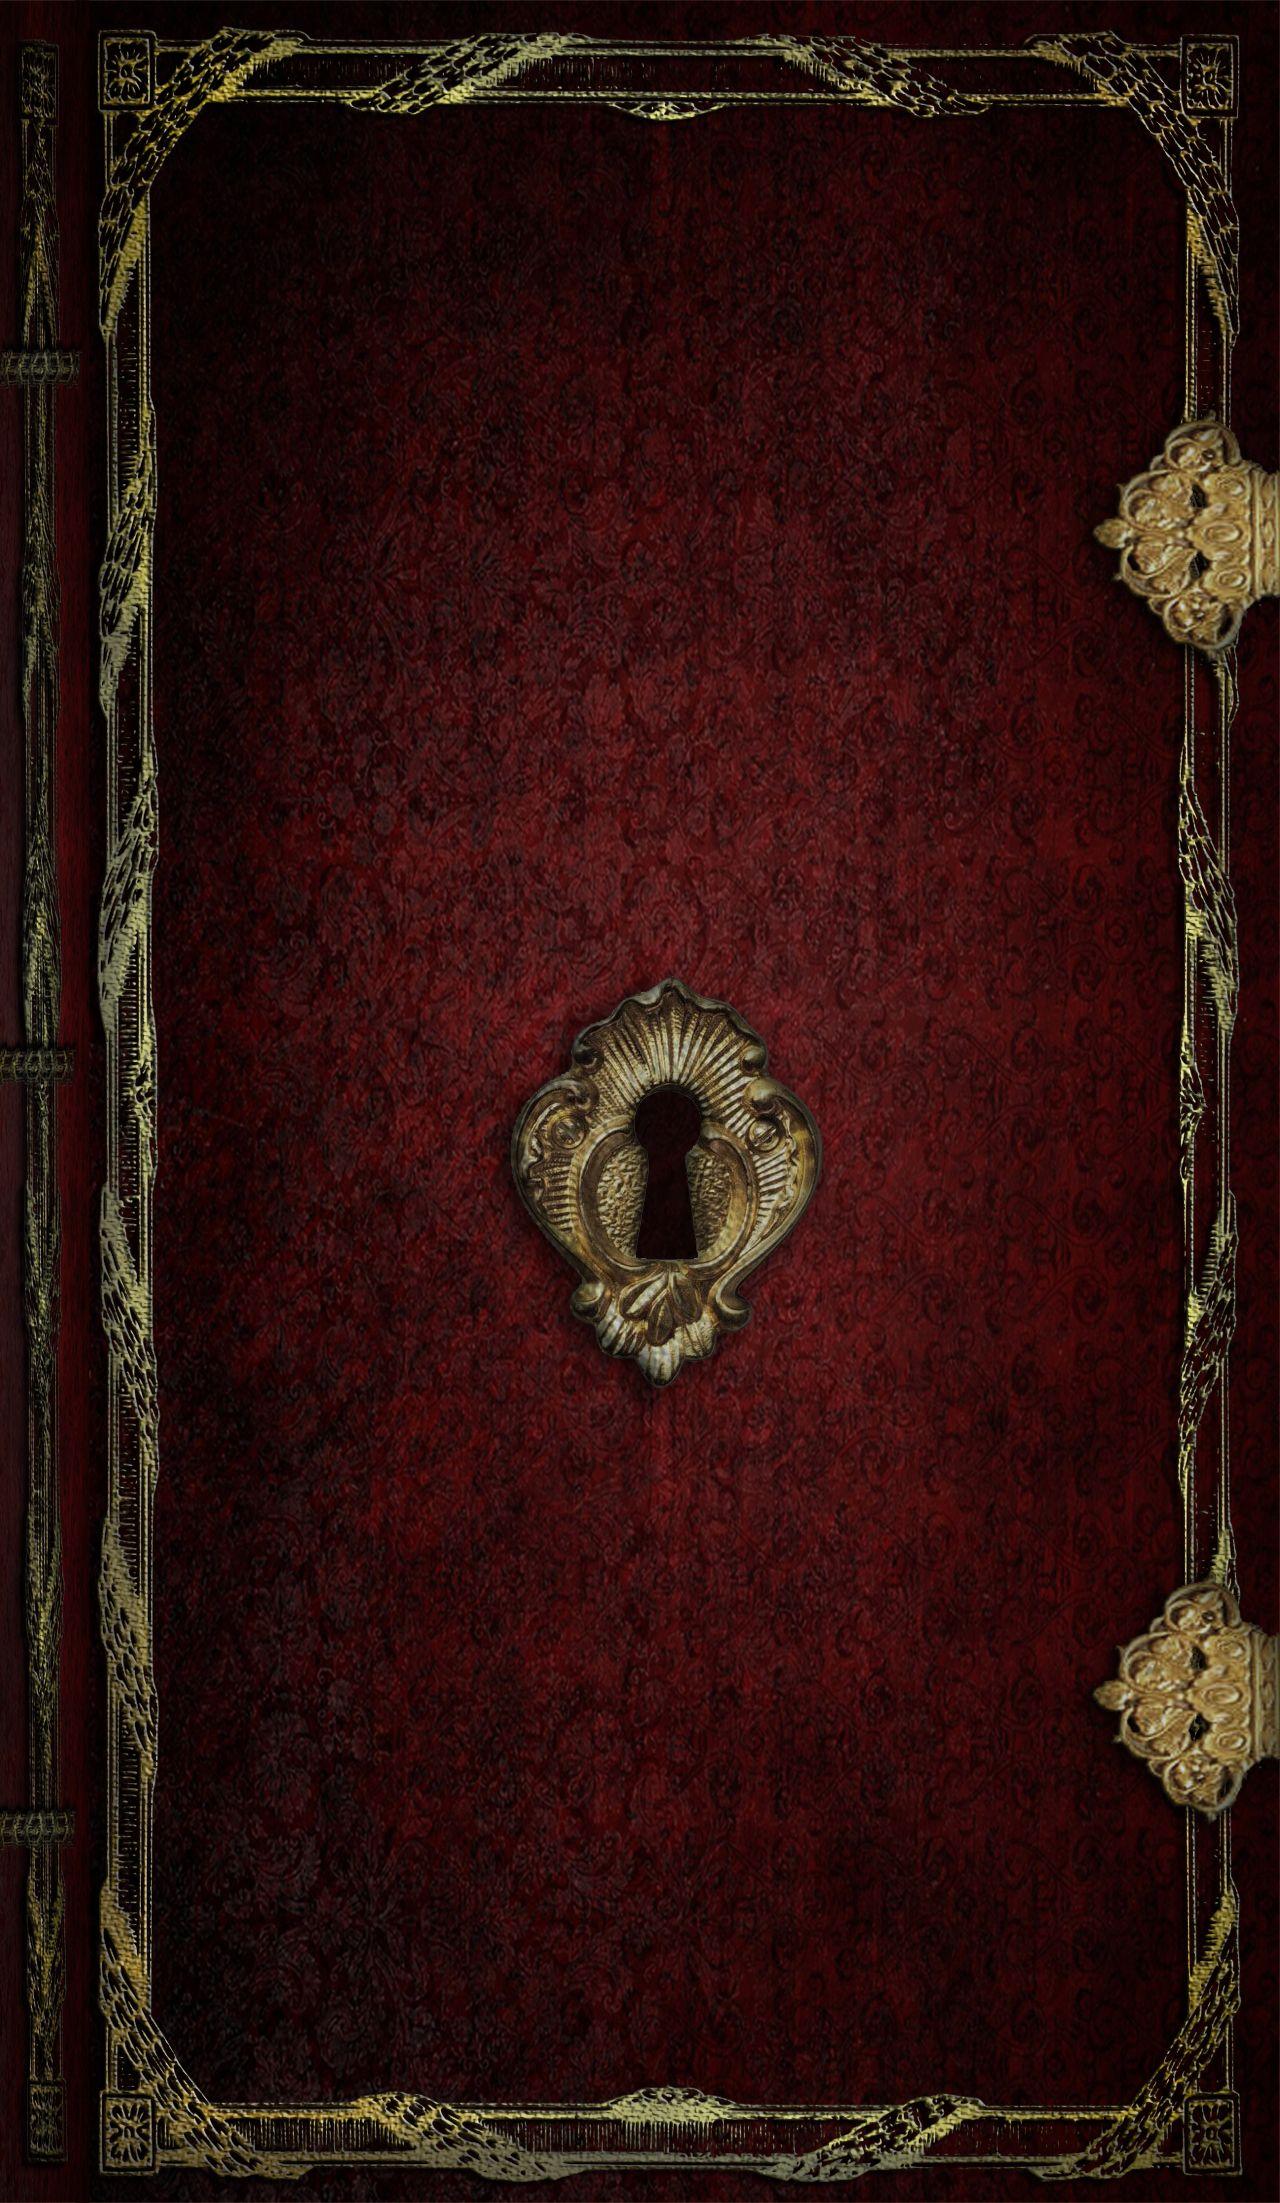 Locked Book IPhone Wallpaper Gold wallpaper iphone